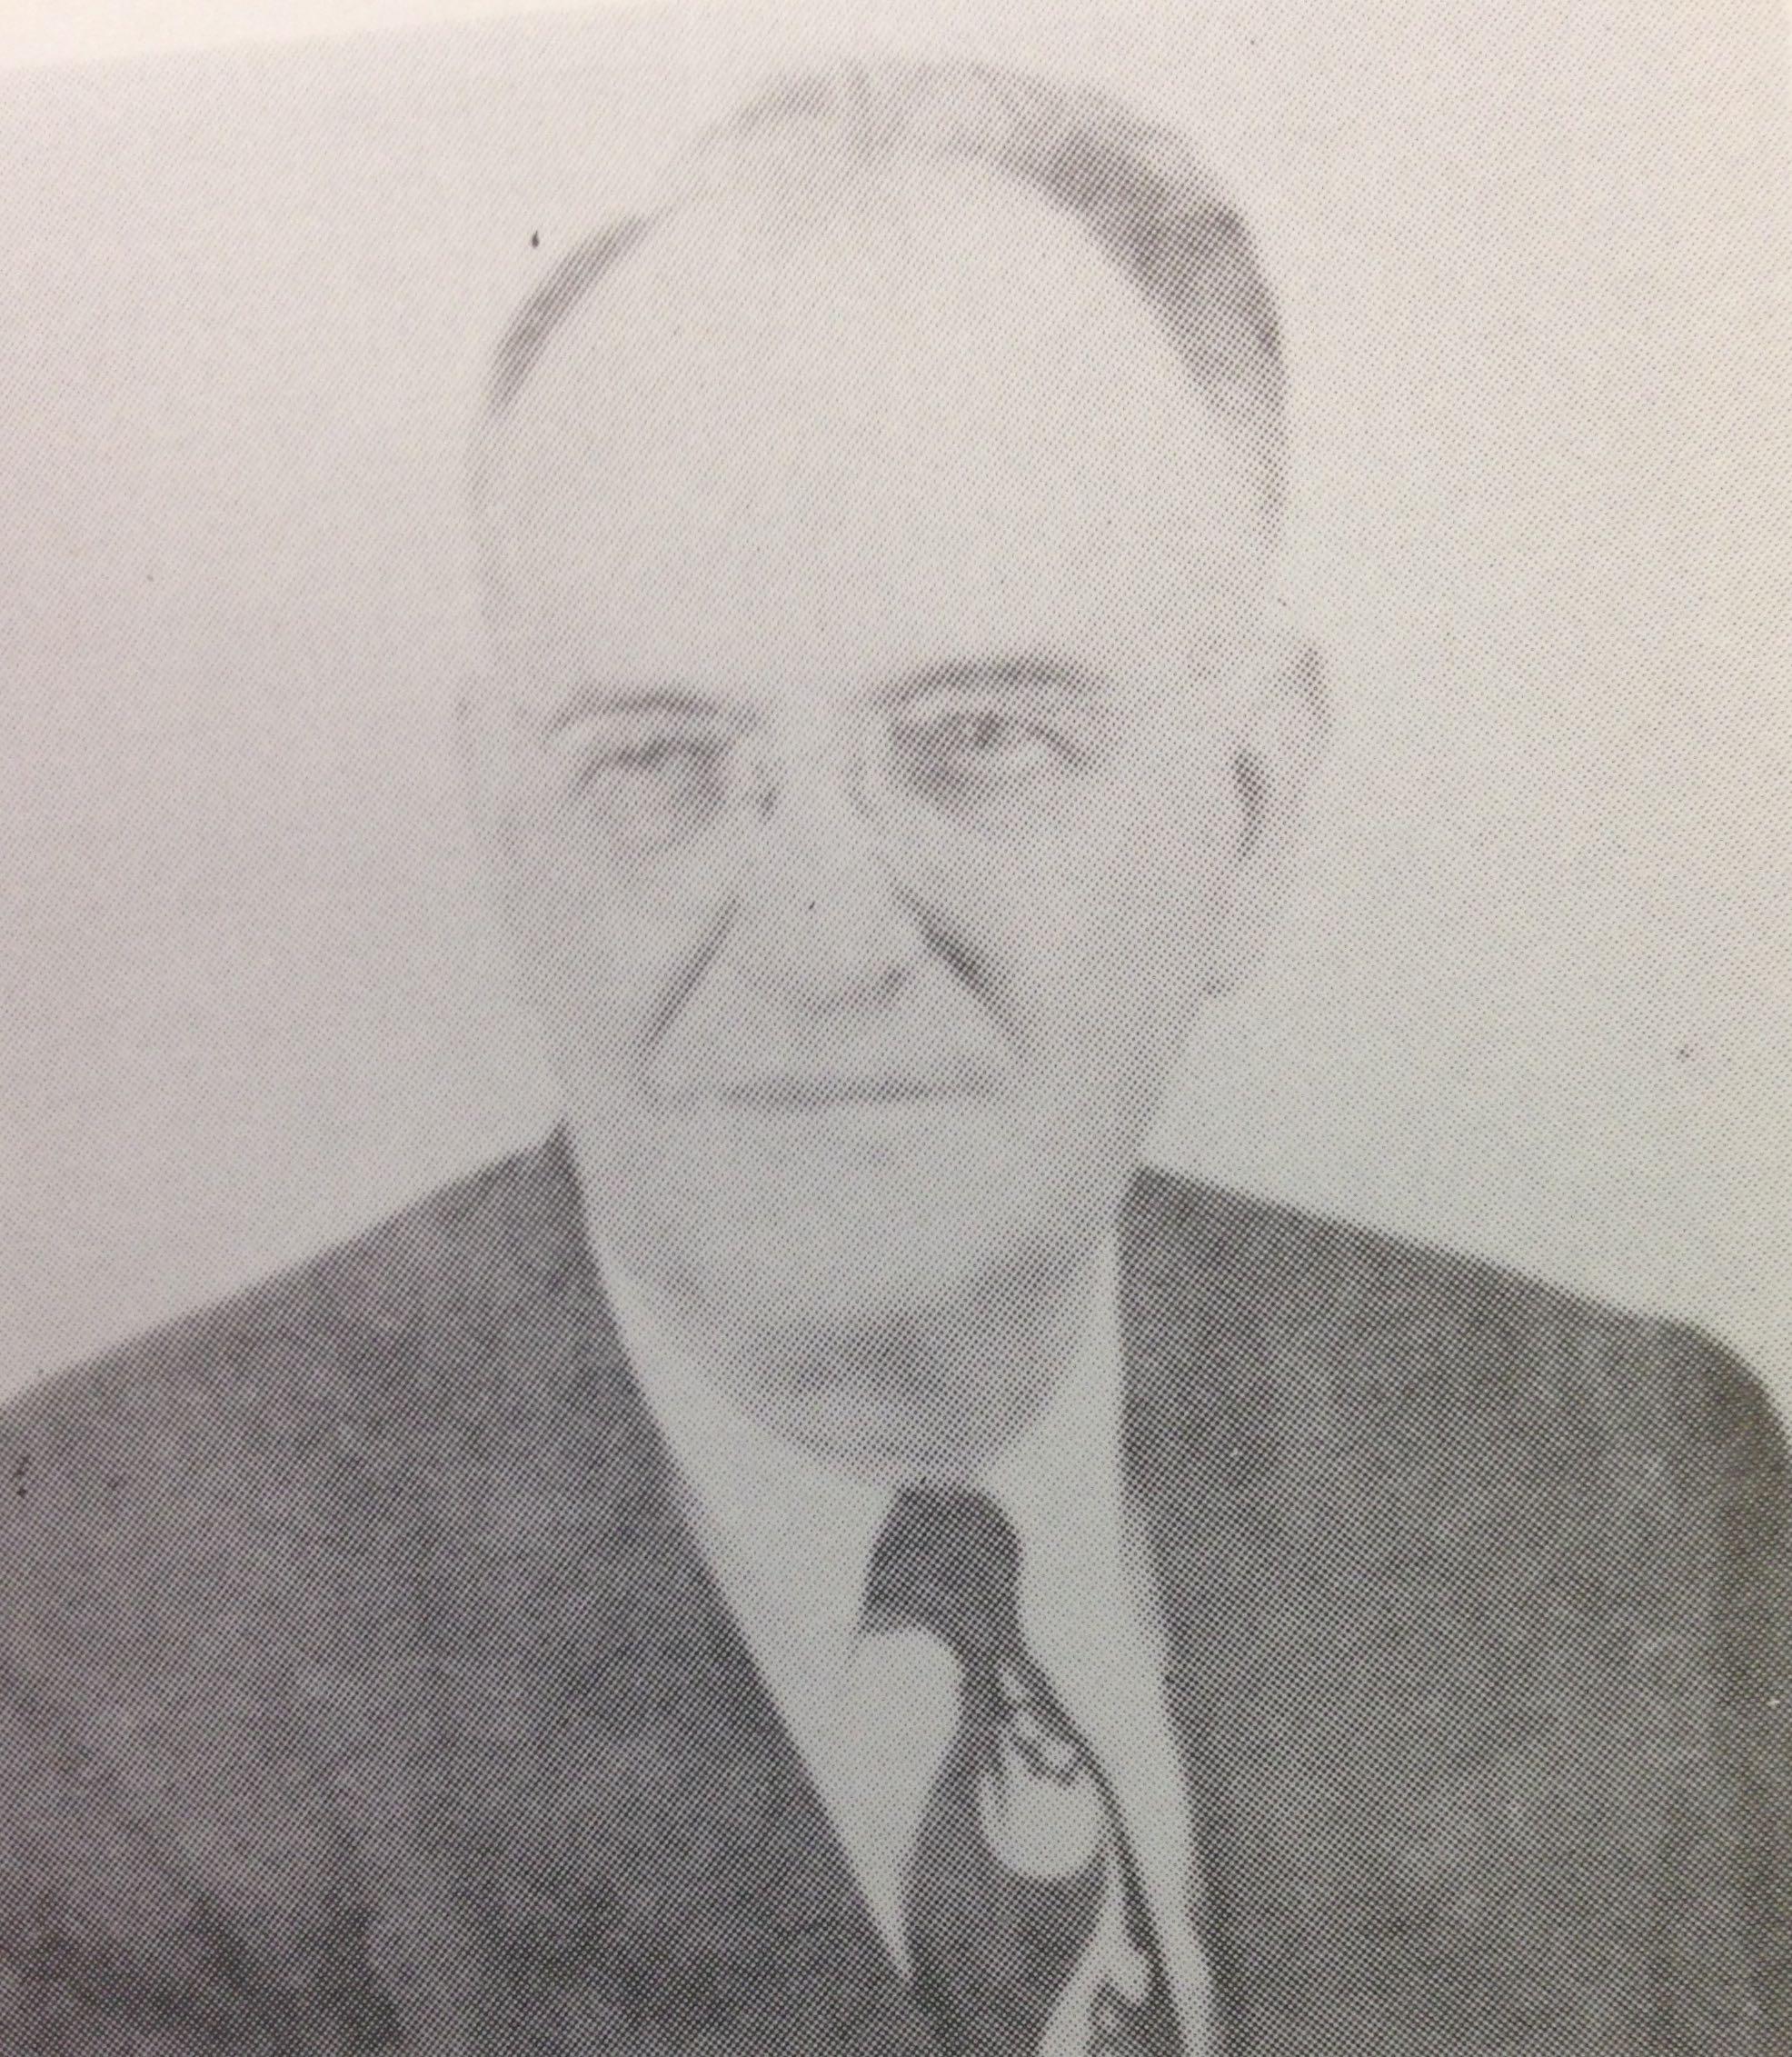 M.D. Walter Clifton Payne, Sr.